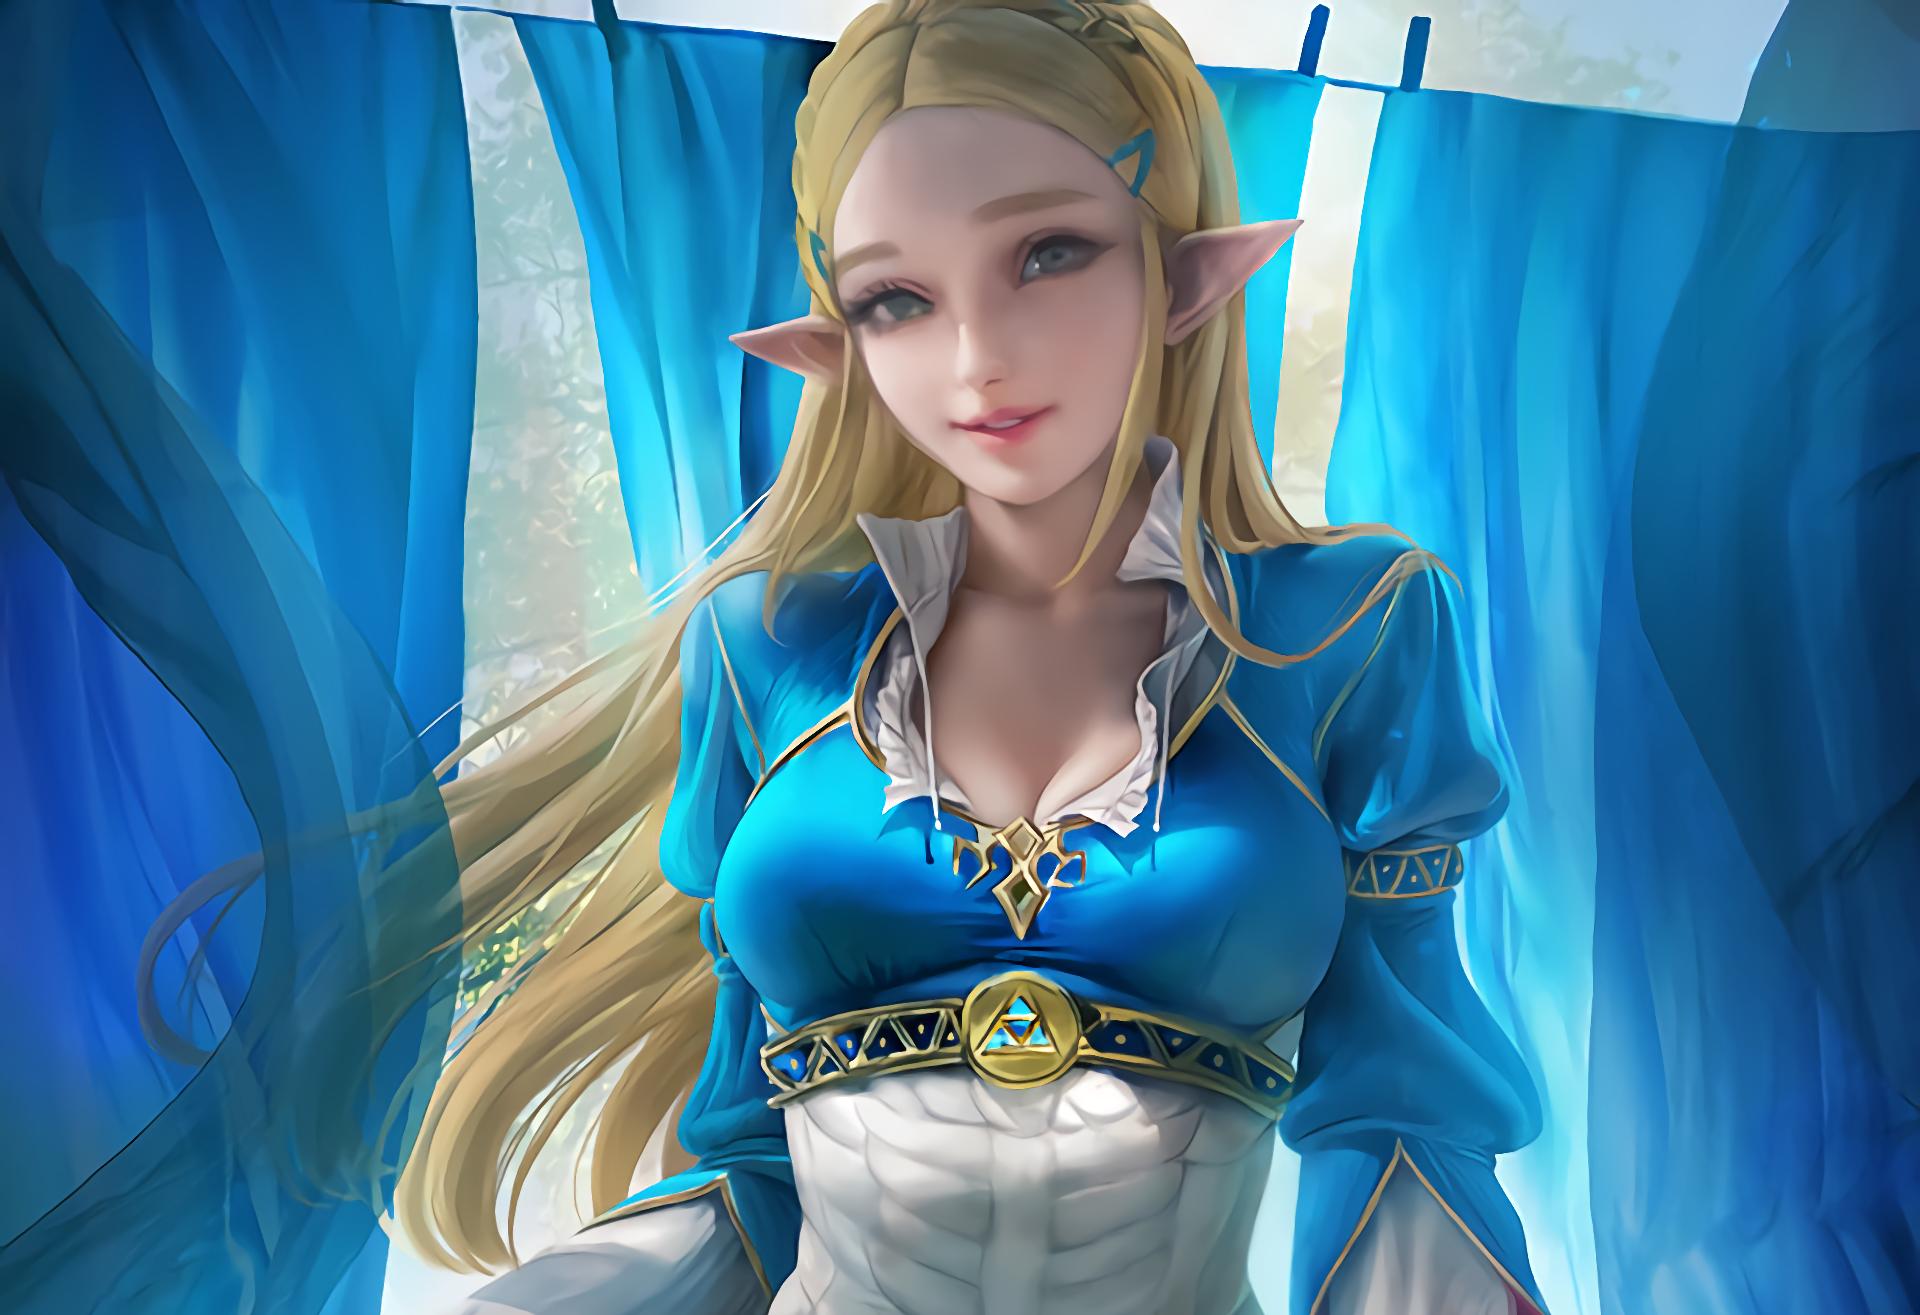 Anime Anime Girls Princess Zelda The Legend Of Zelda Breath Of The Wild Sakimichan Blonde Long Hair  1920x1315